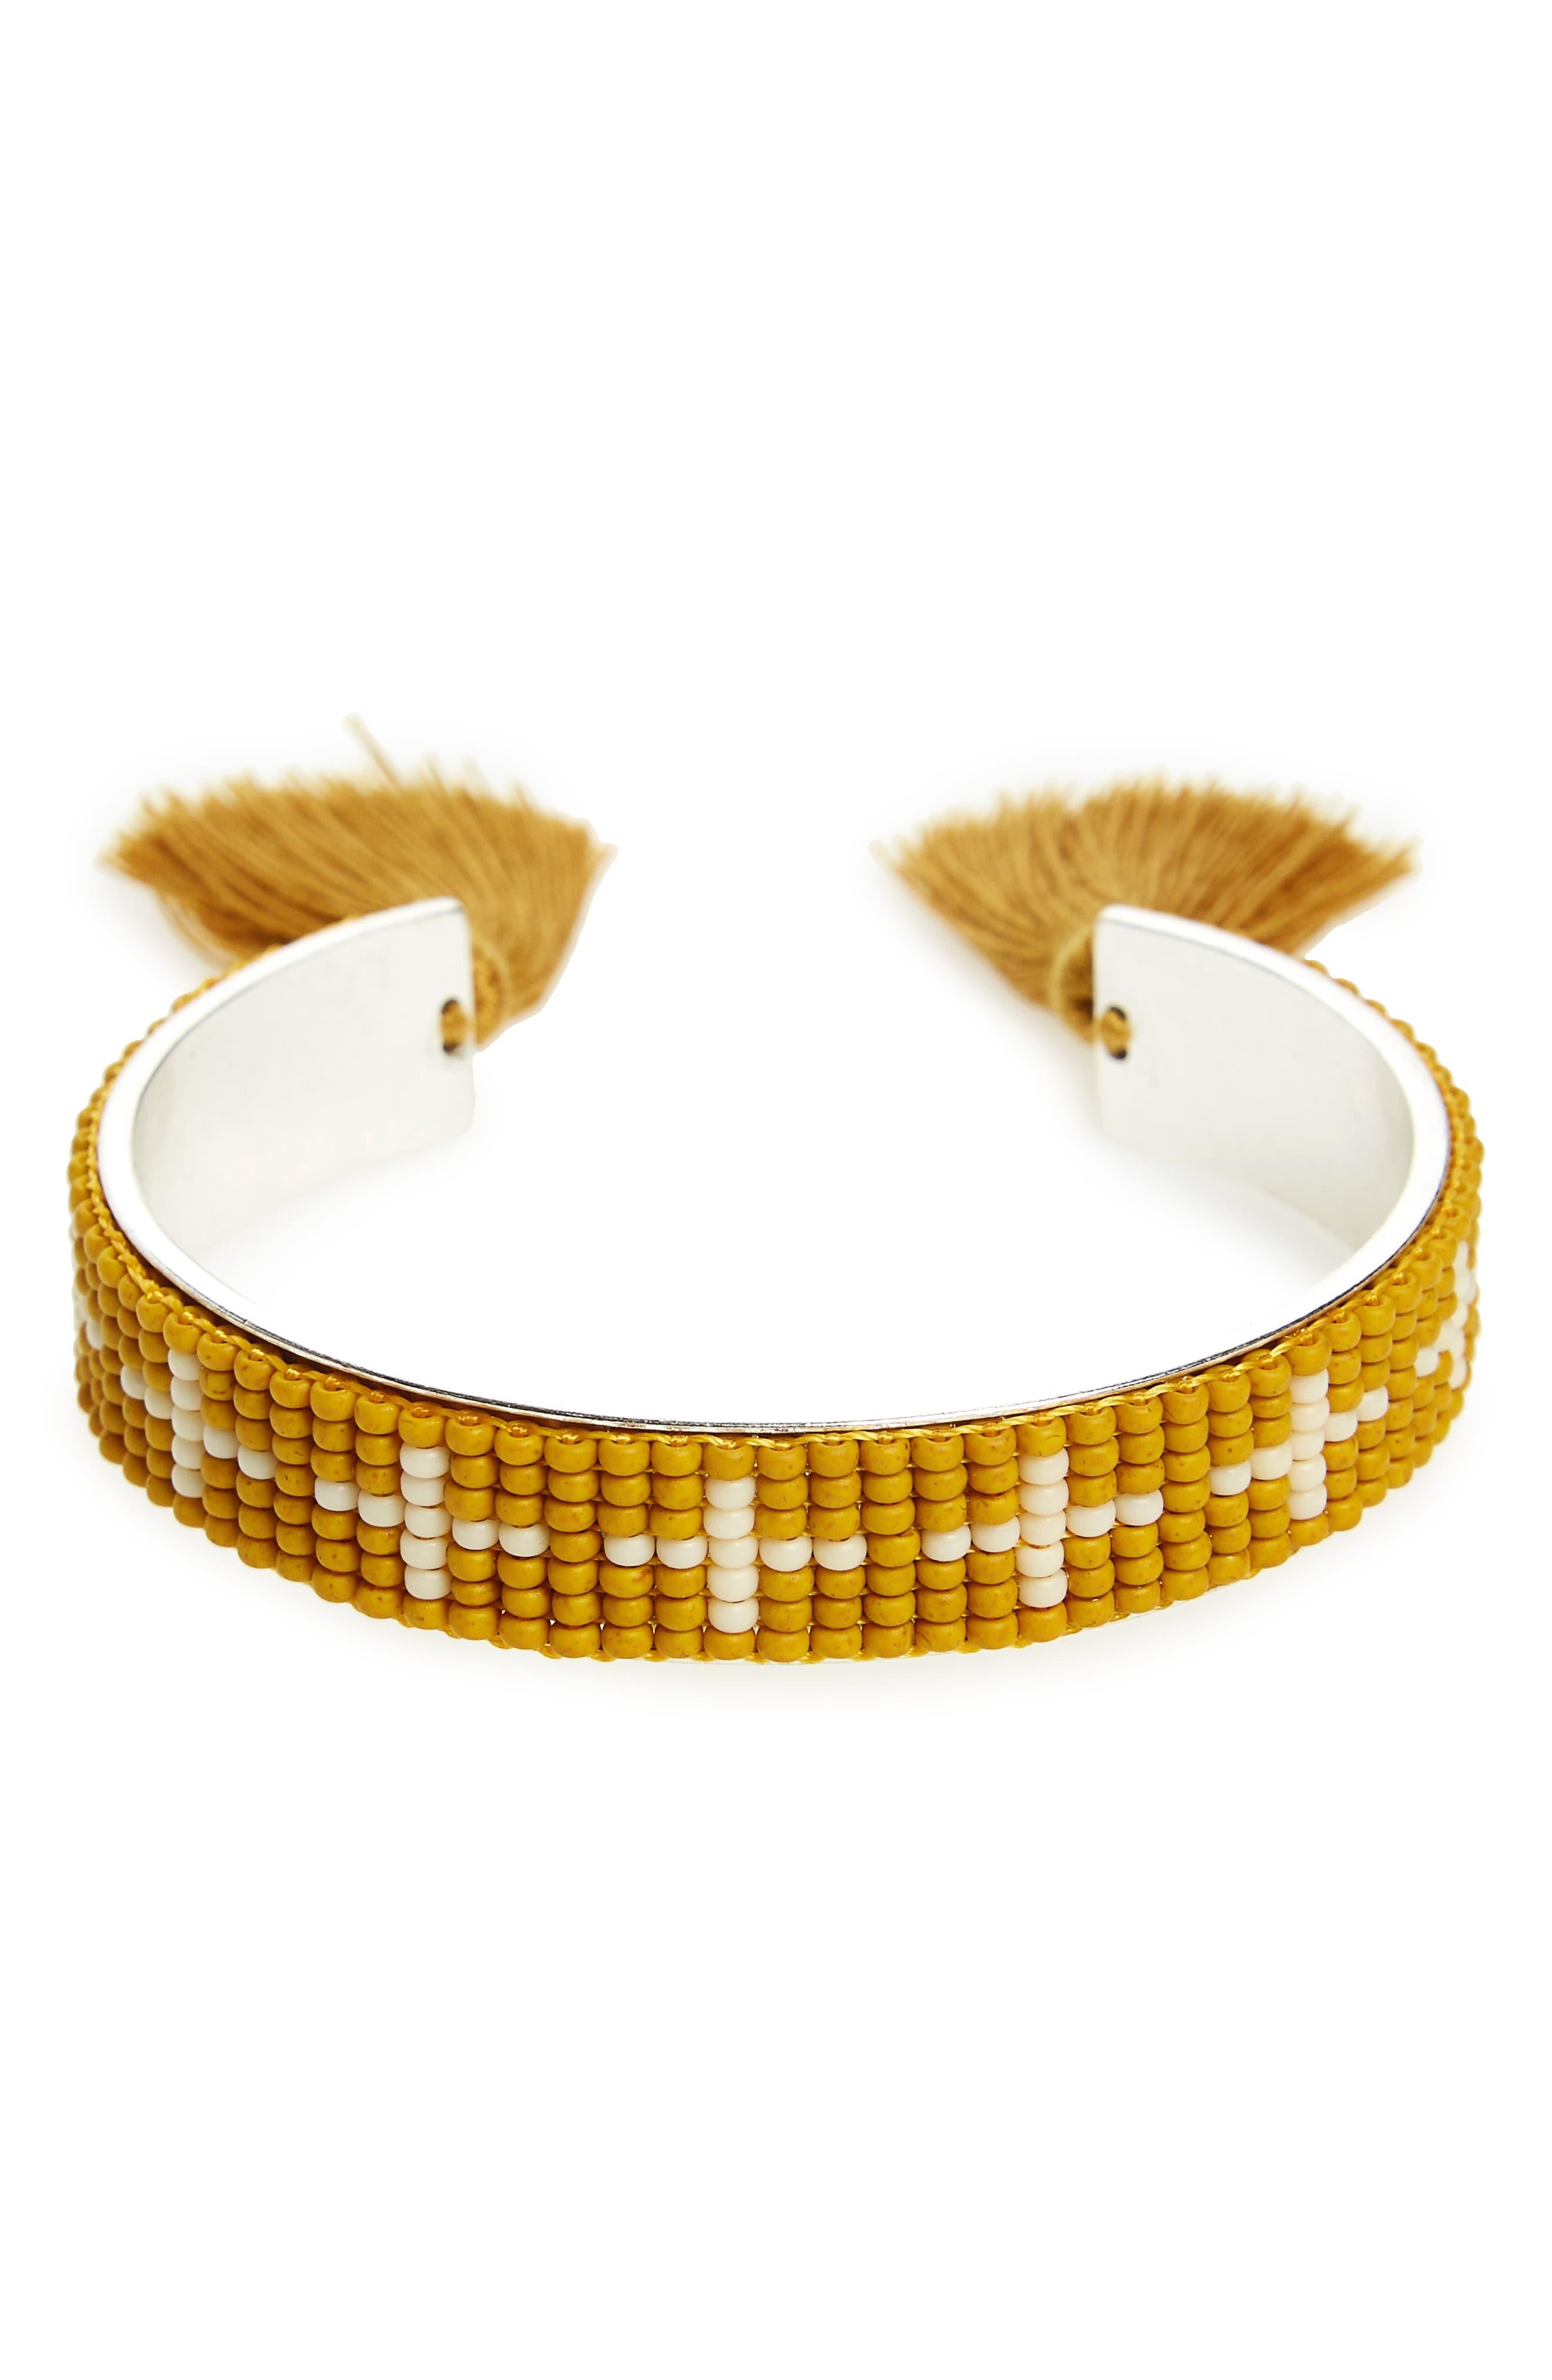 Alternate Image 1 Selected - Madewell Beaded Cuff Bracelet